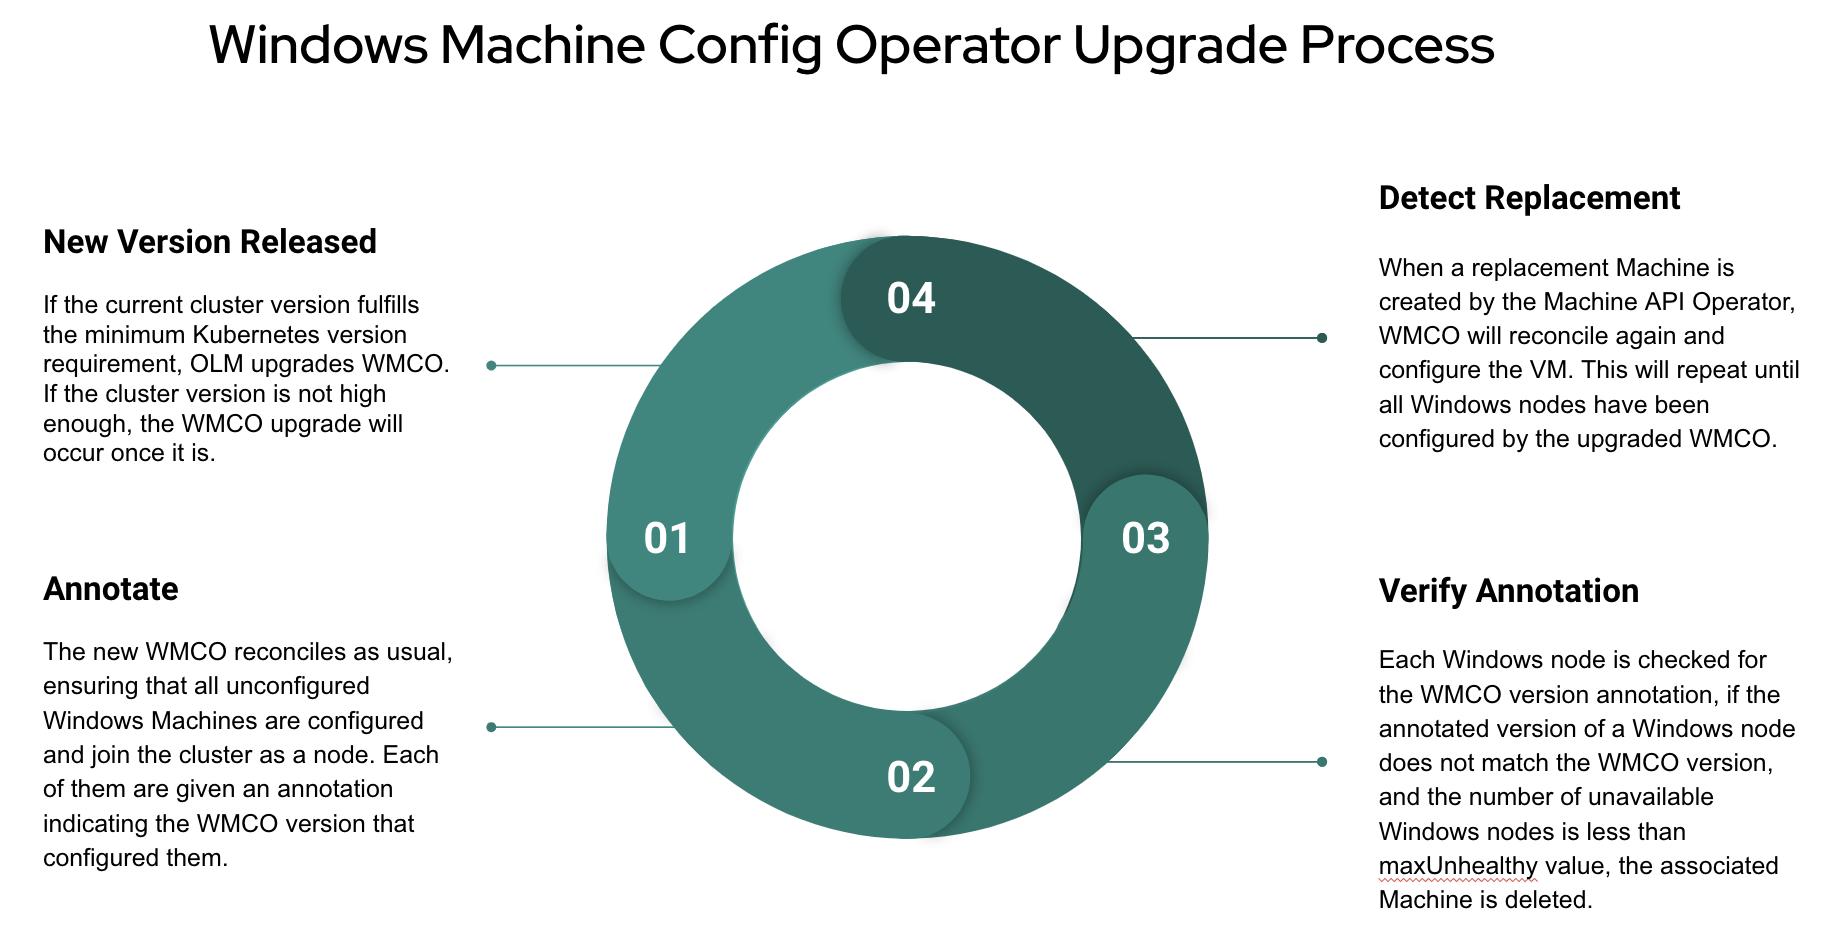 WMCO Upgrade Process